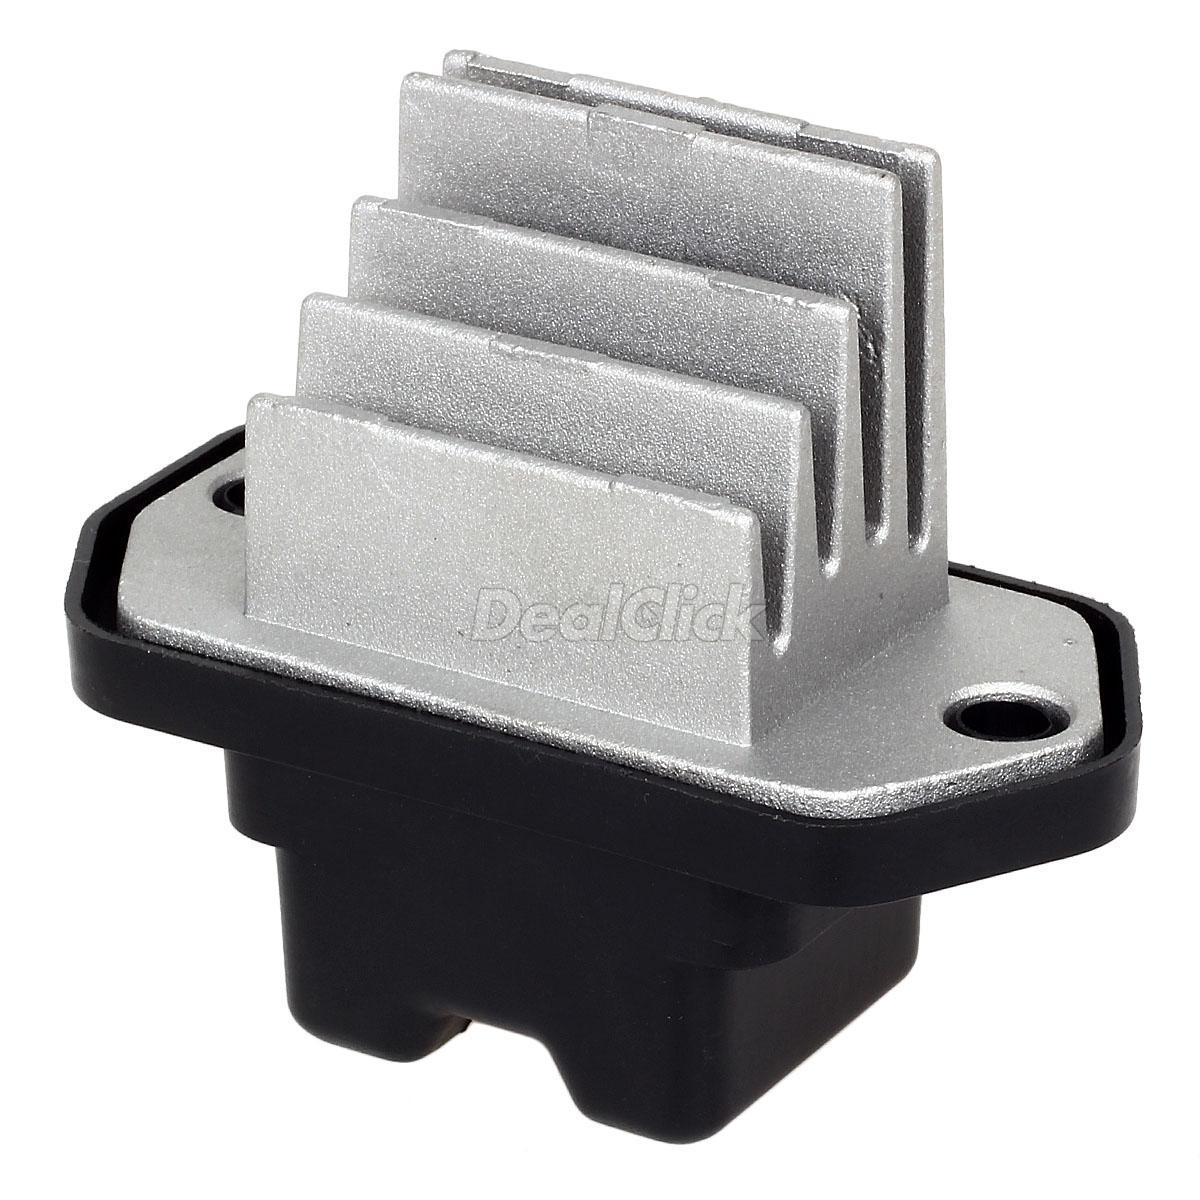 OEM# 79330S6M941 A/C Heater Blower Motor Resistor